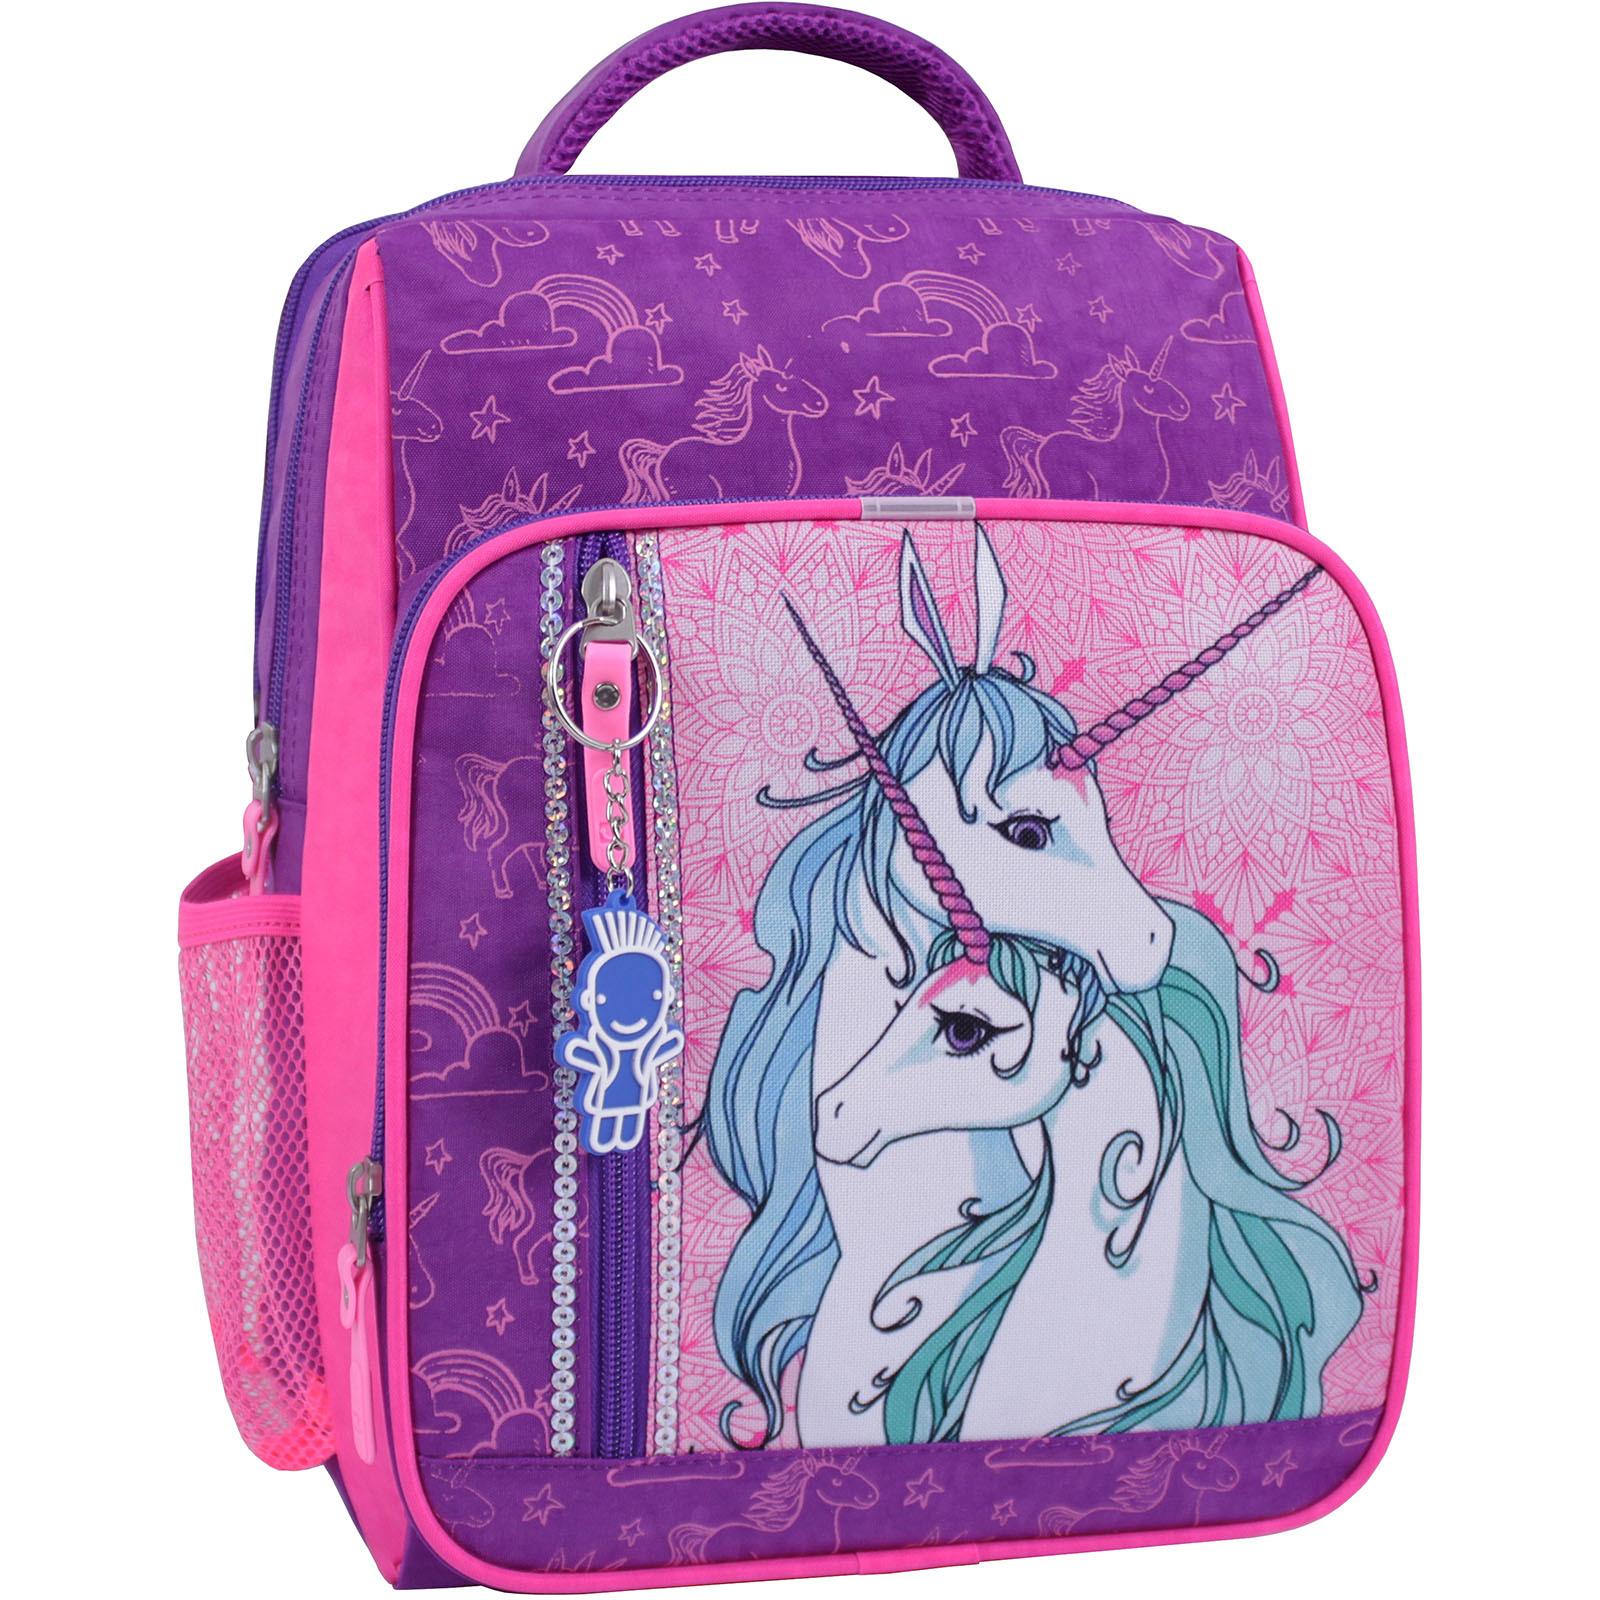 Школьные рюкзаки Рюкзак школьный Bagland Школьник 8 л. фиолетовый 596 (0012870) IMG_1082_суб.596_.JPG